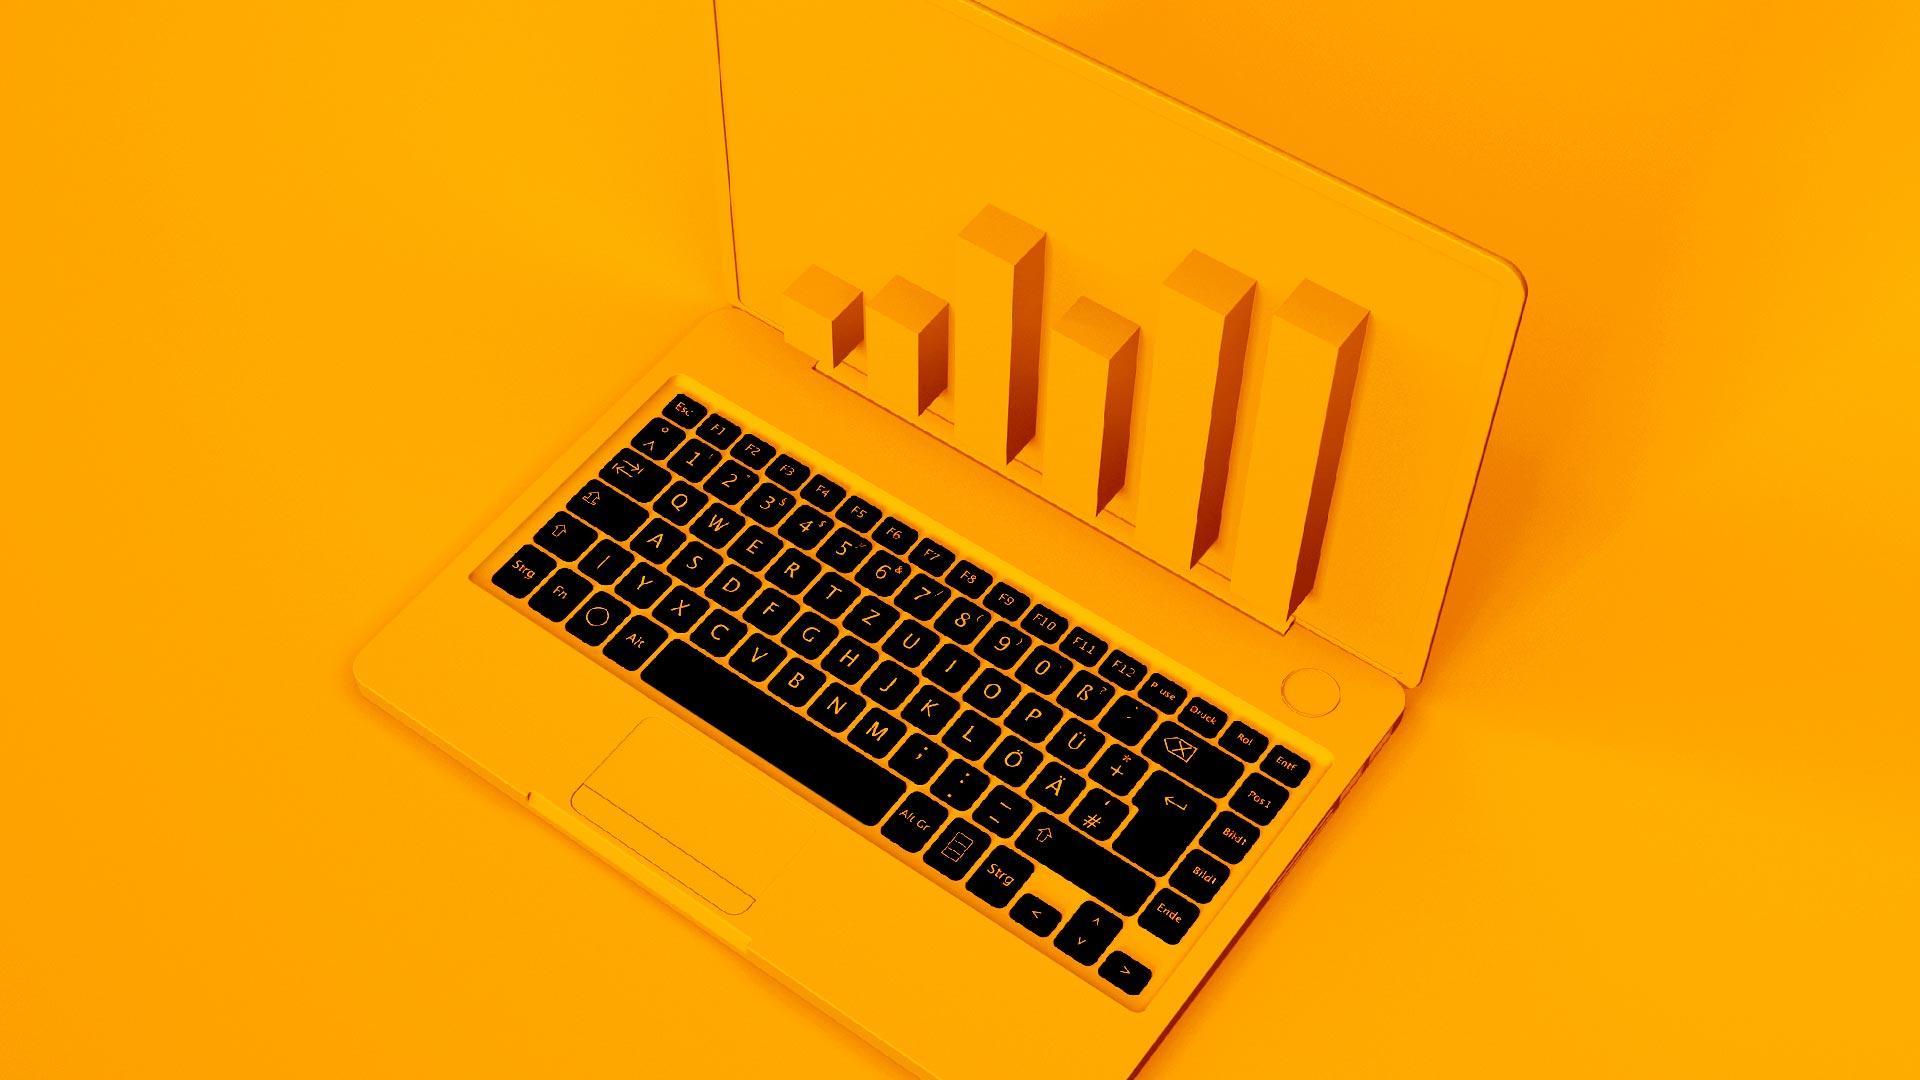 digital report on laptop in 3d